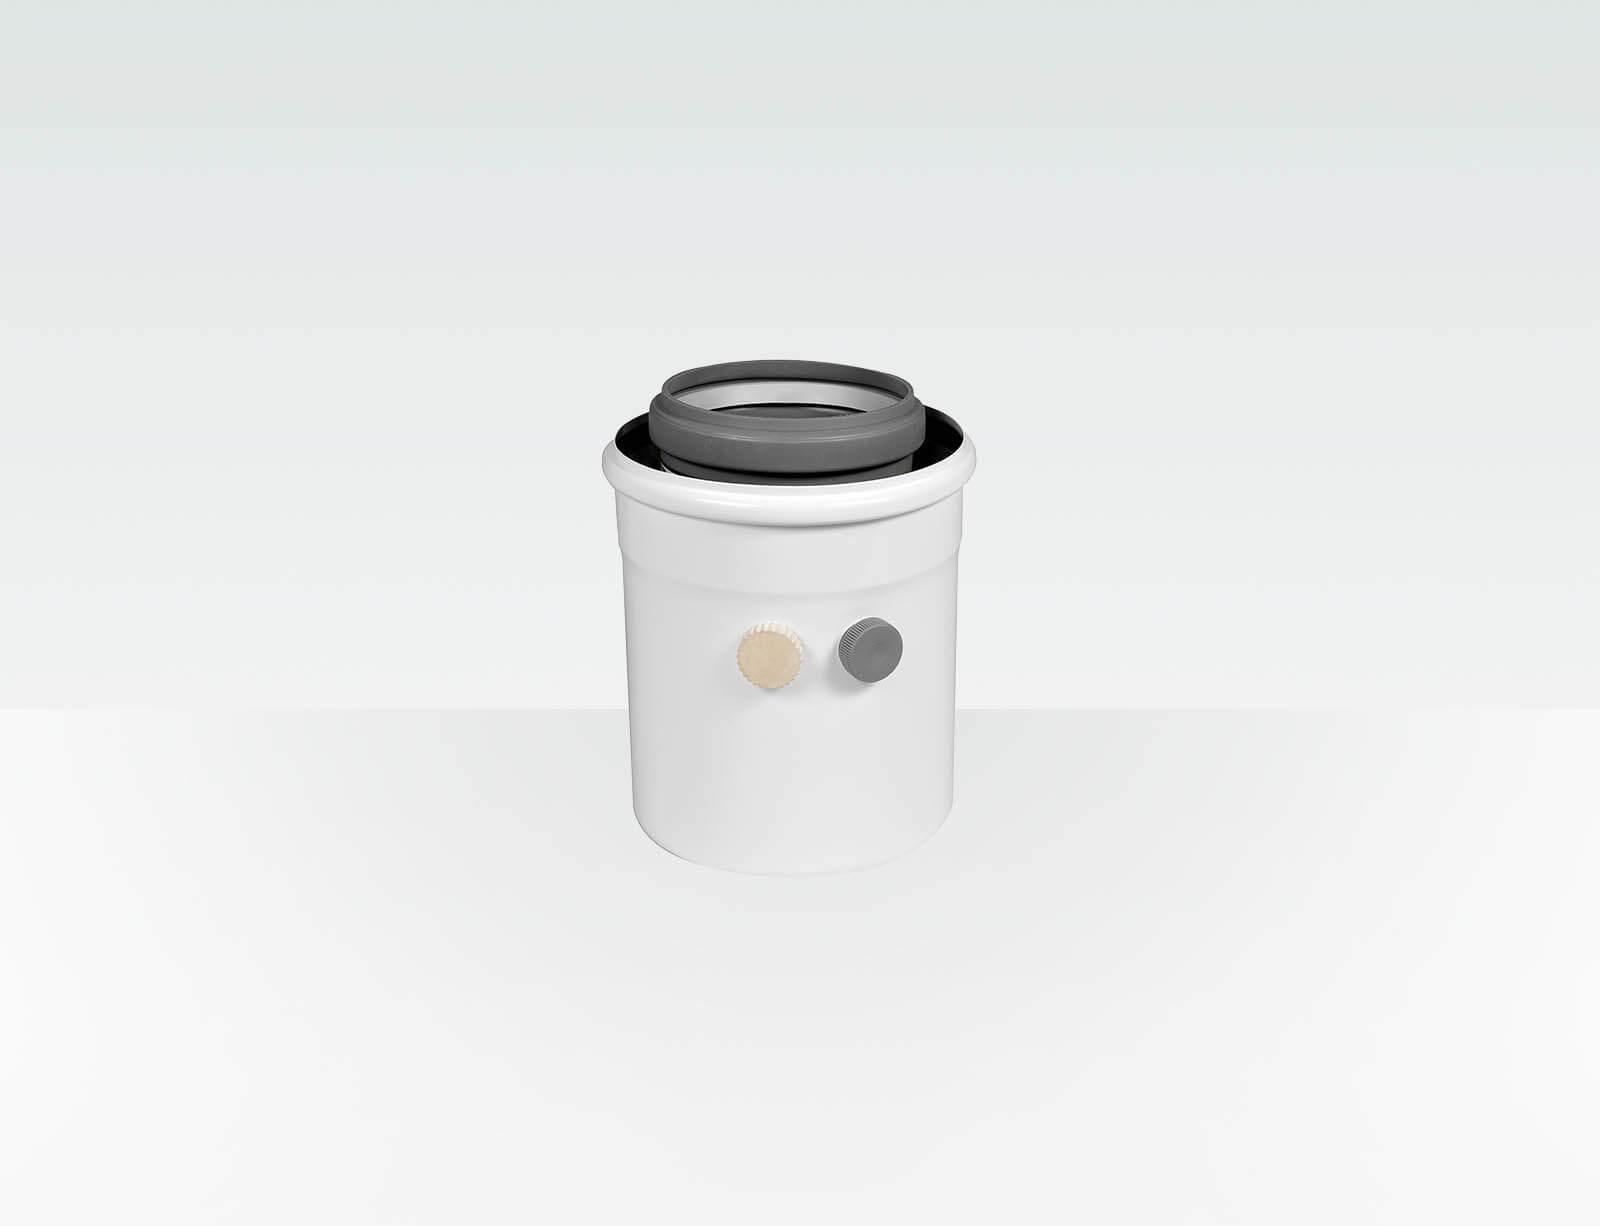 productfoto Concentric Test Port